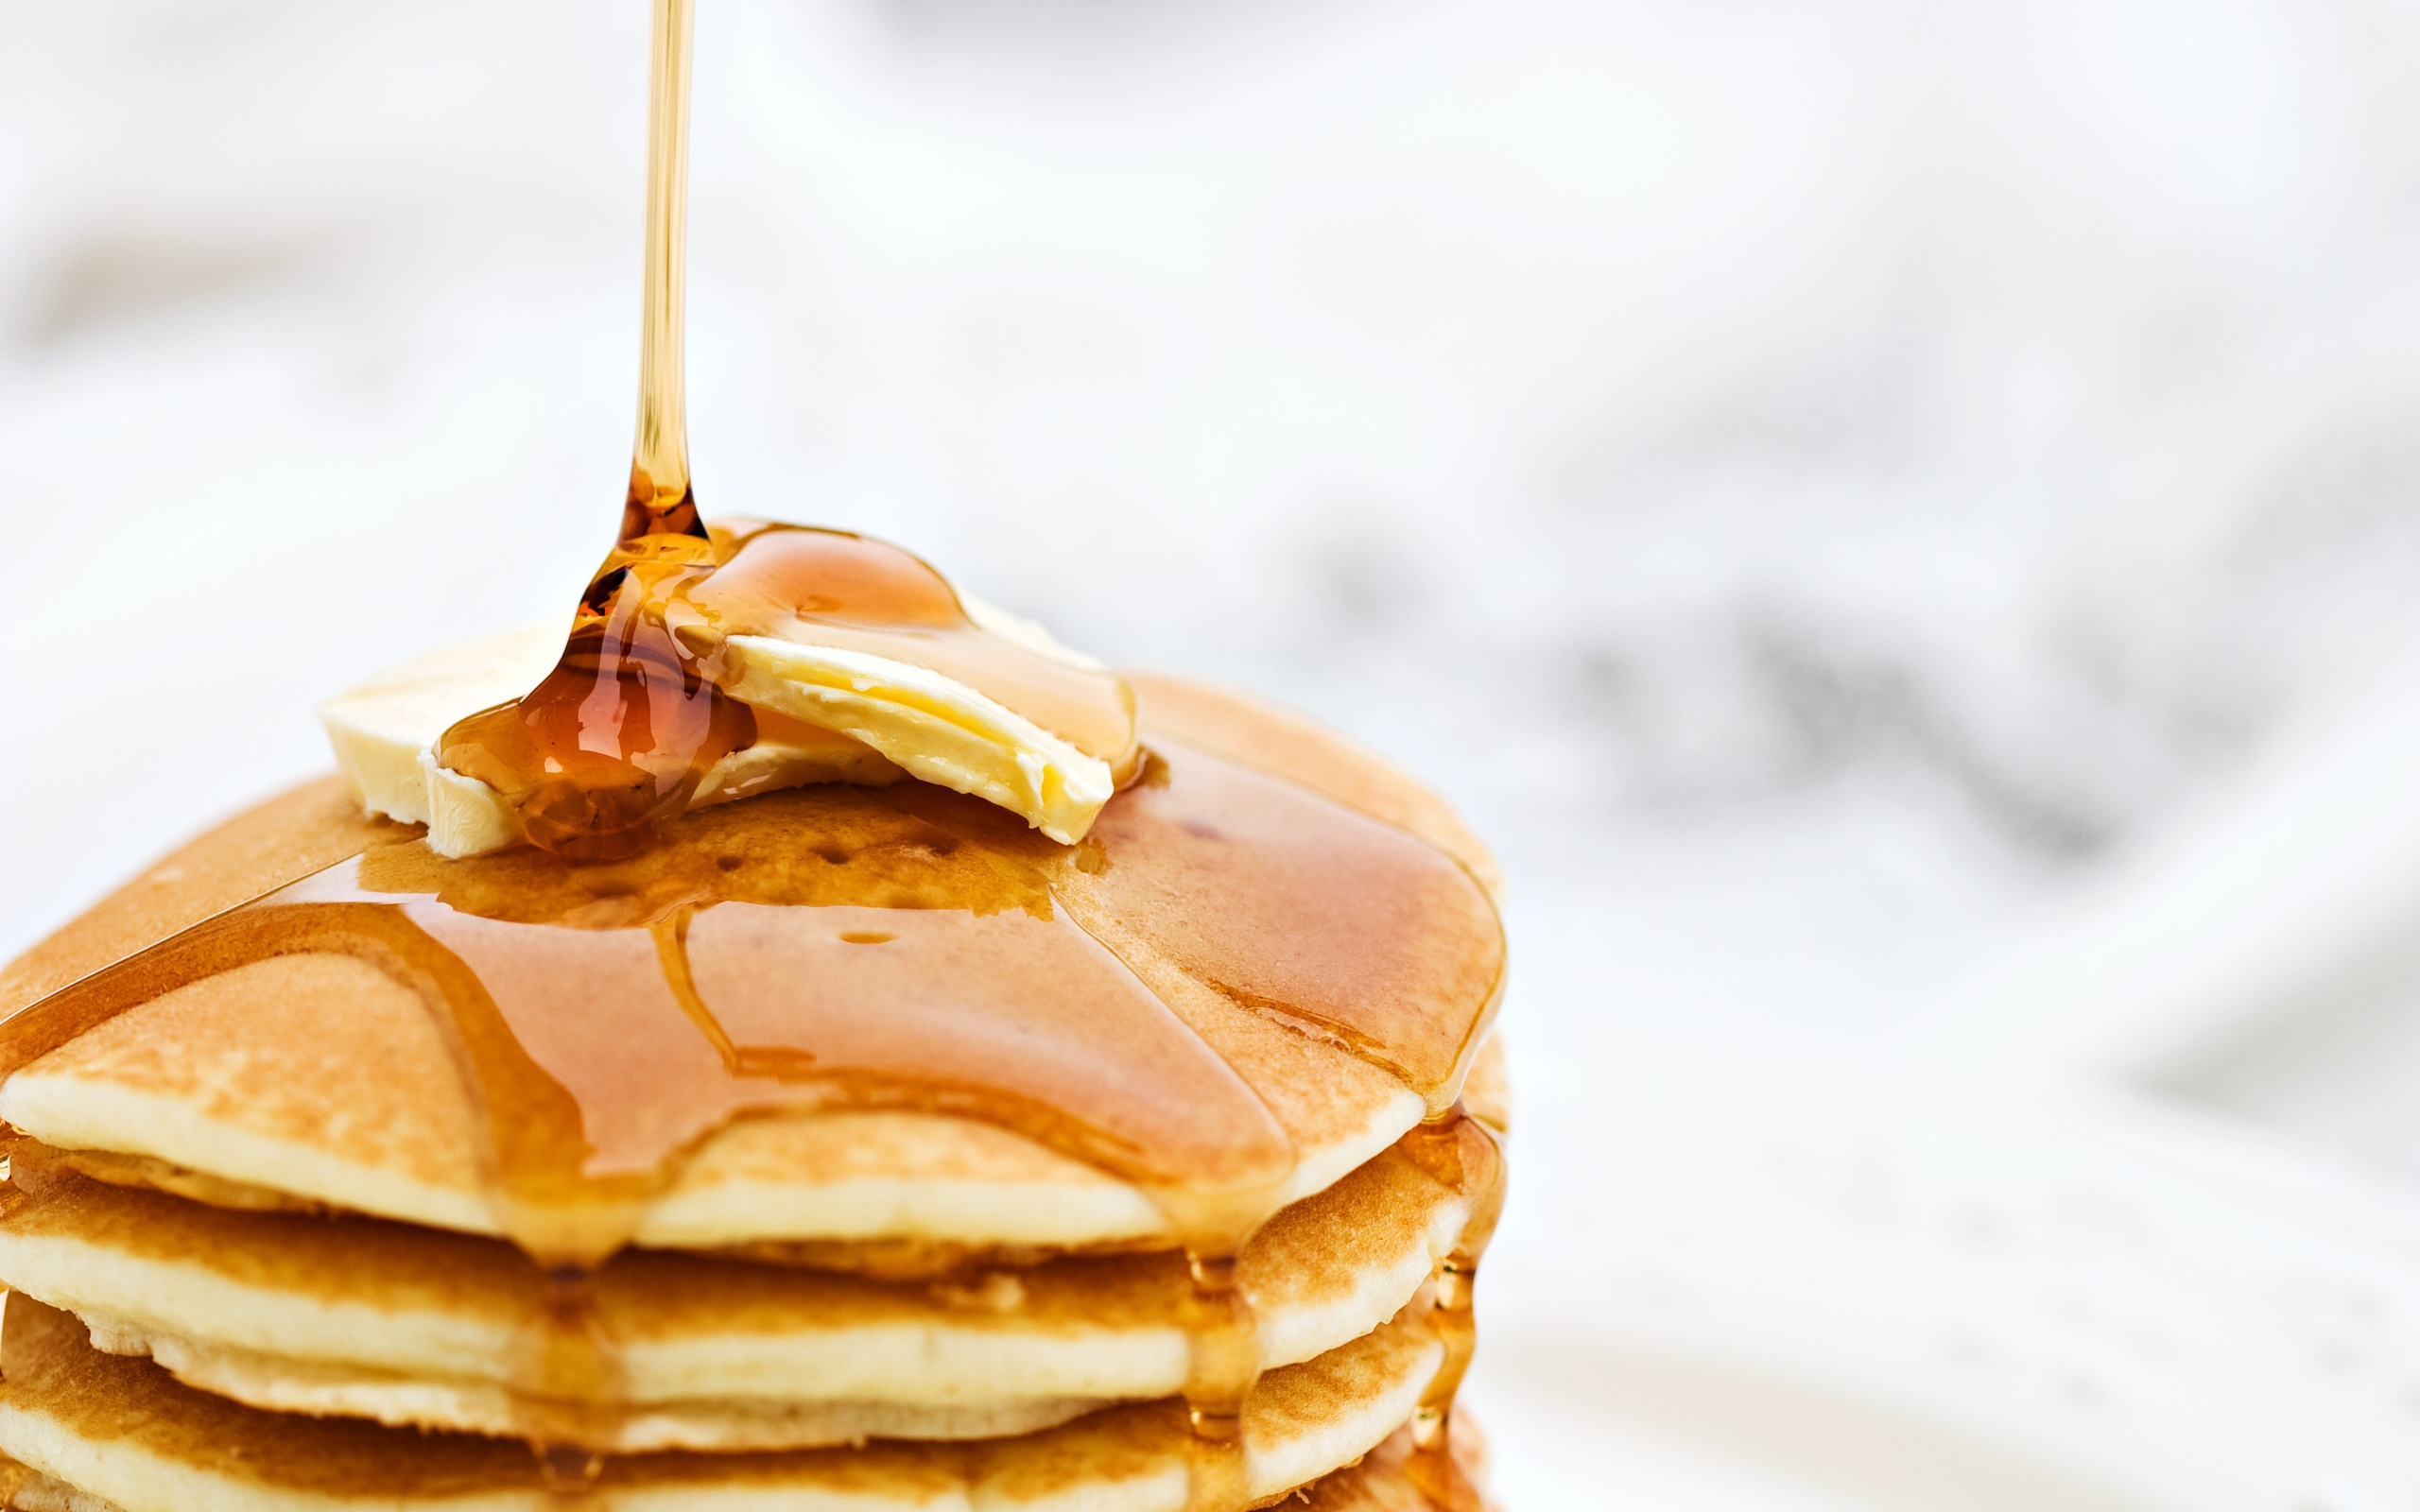 Awesome Pancakes Wallpaper 6772876 2560x1600